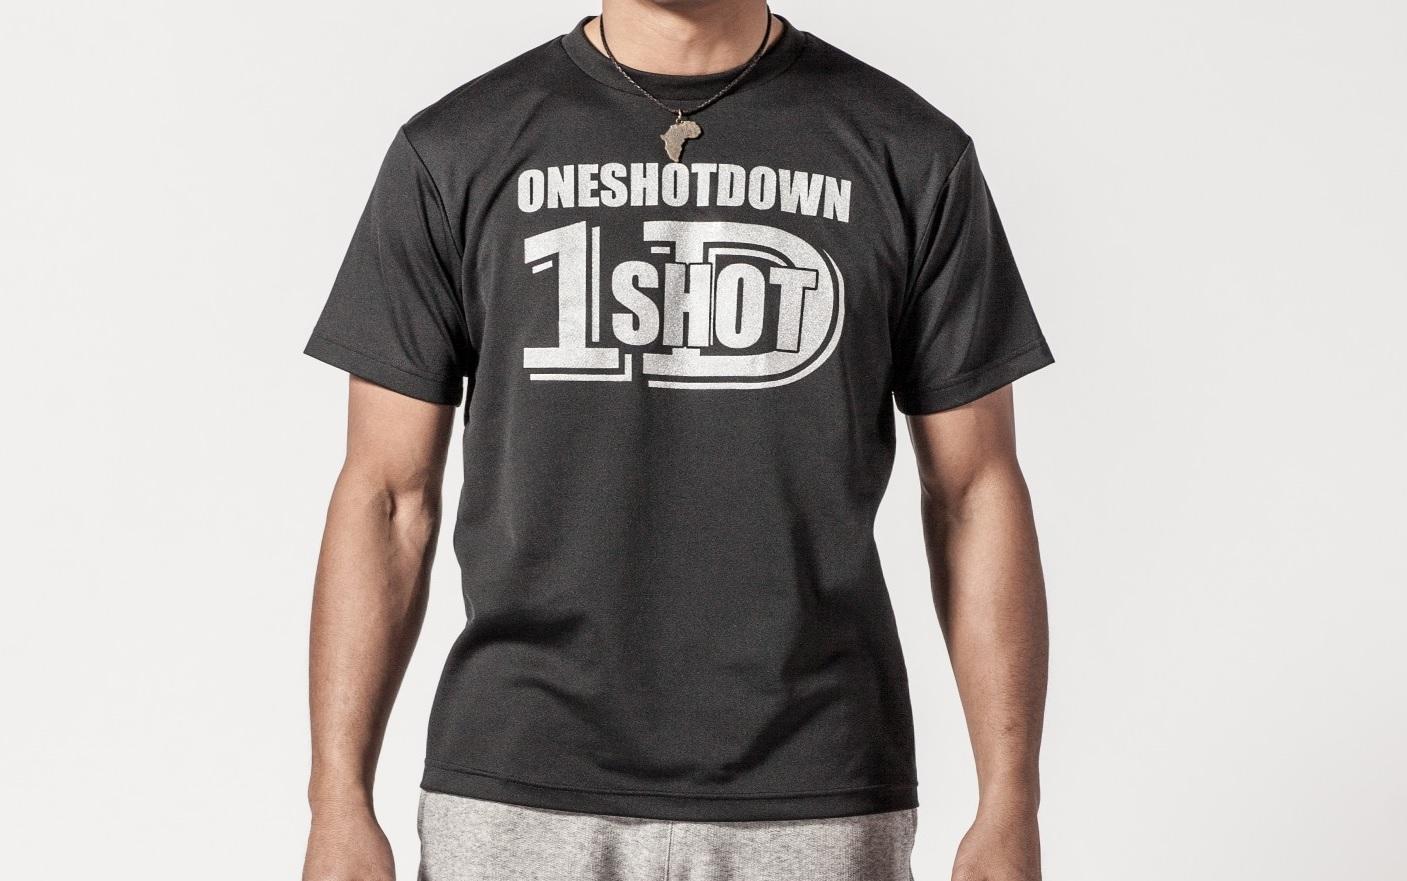 ONESHOTDOWN ロゴ ドライTシャツ - 画像2